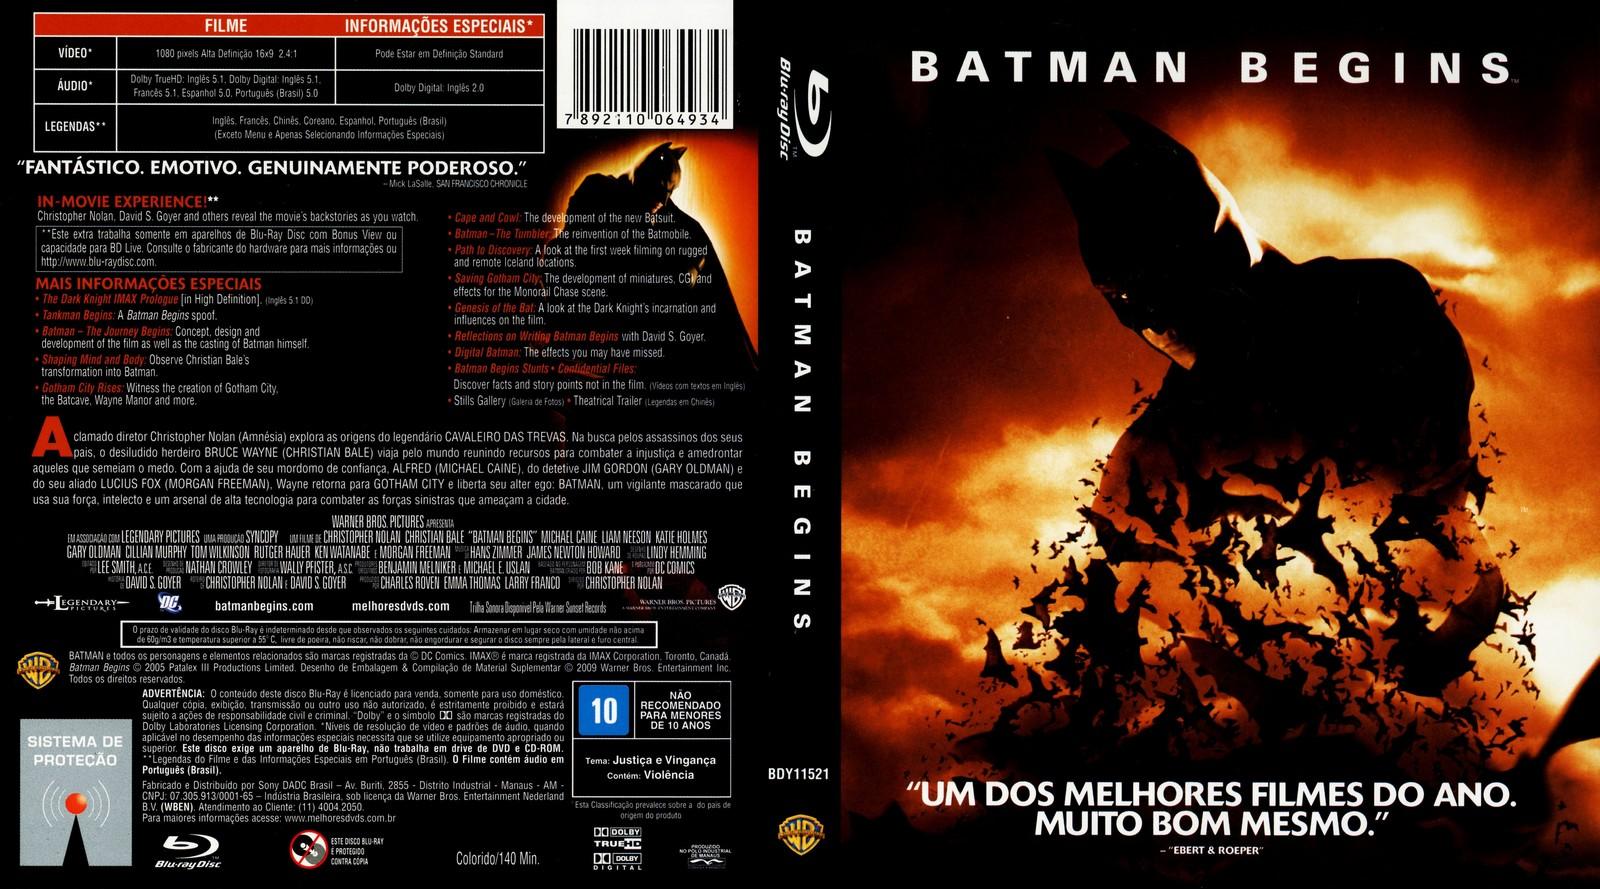 http://1.bp.blogspot.com/_Tgeb_LTYc0o/S8ccSvuZpwI/AAAAAAAAAaE/uM7sde1pOdk/s1600/Batman-Begins.jpg